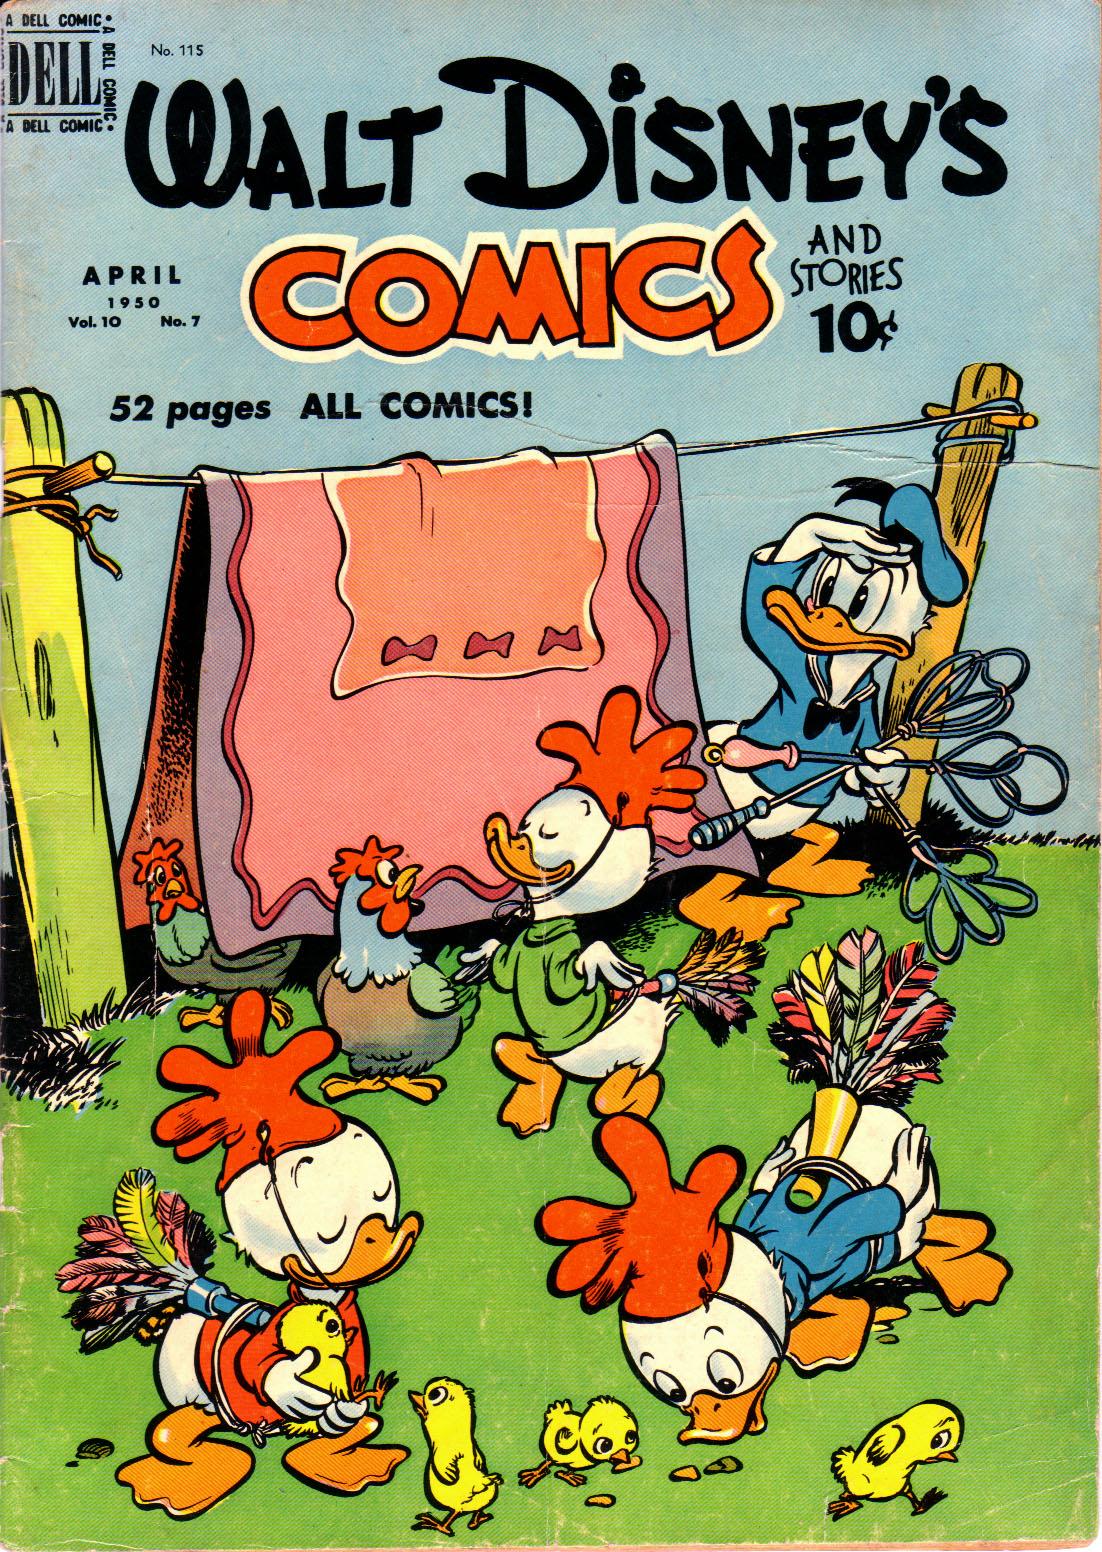 Walt Disneys Comics and Stories 115 Page 1